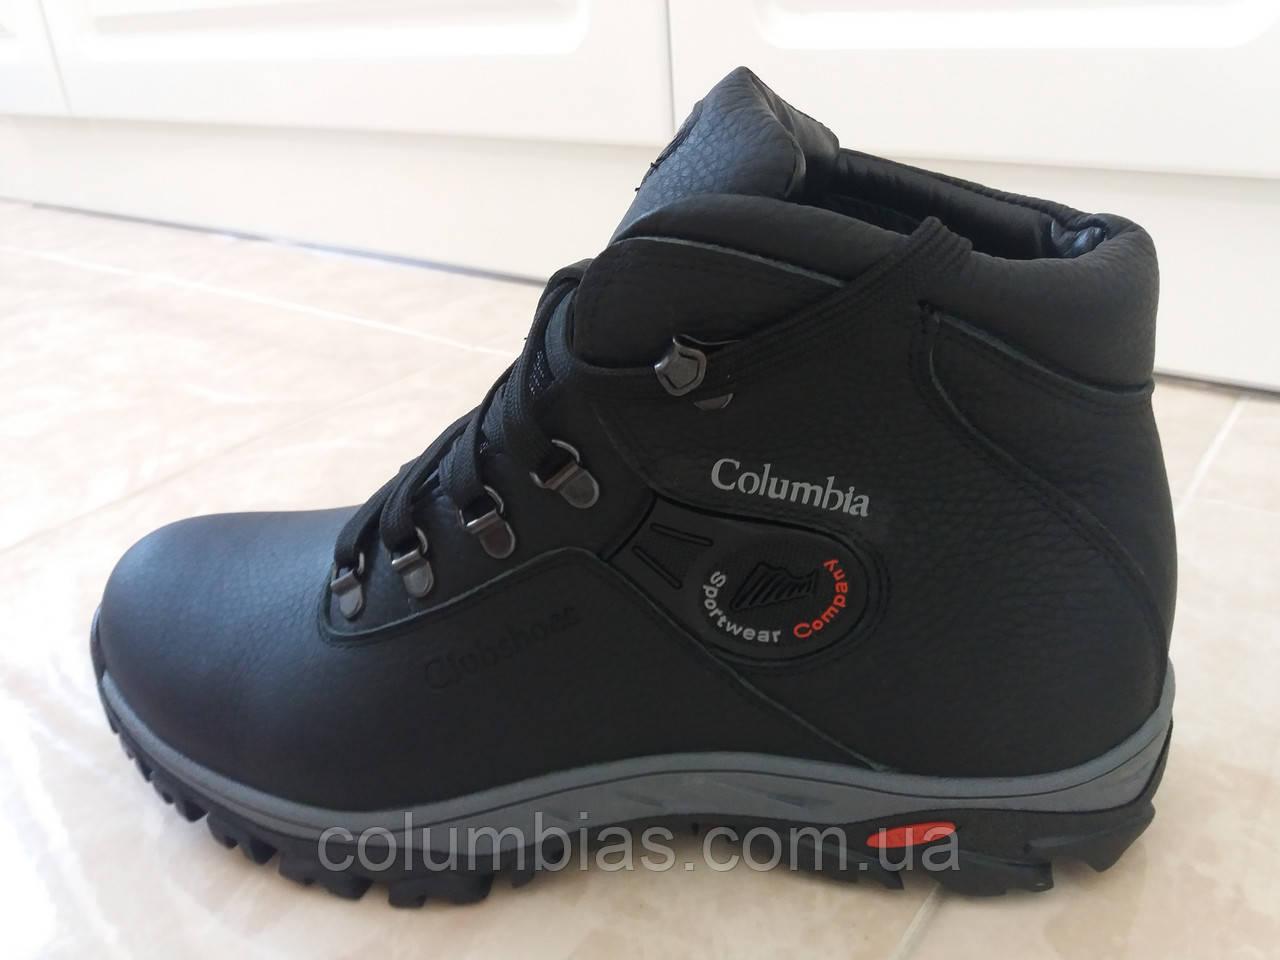 Зимняя обувь colambia